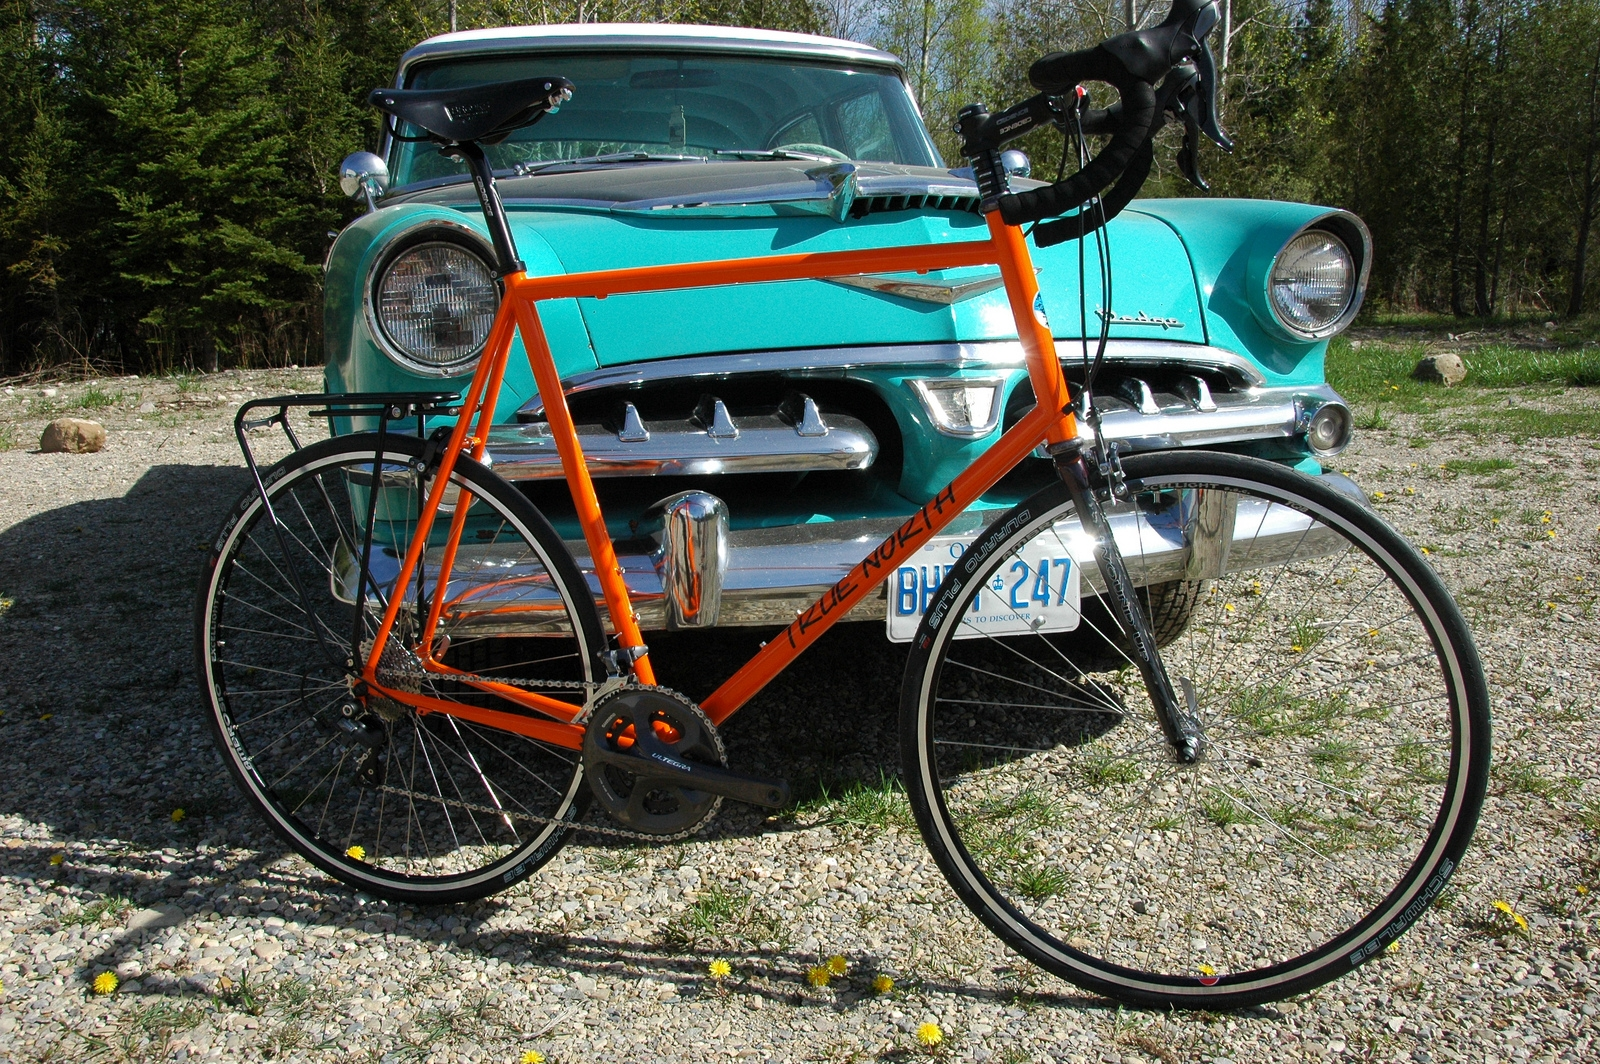 johns-xxl-road-bike